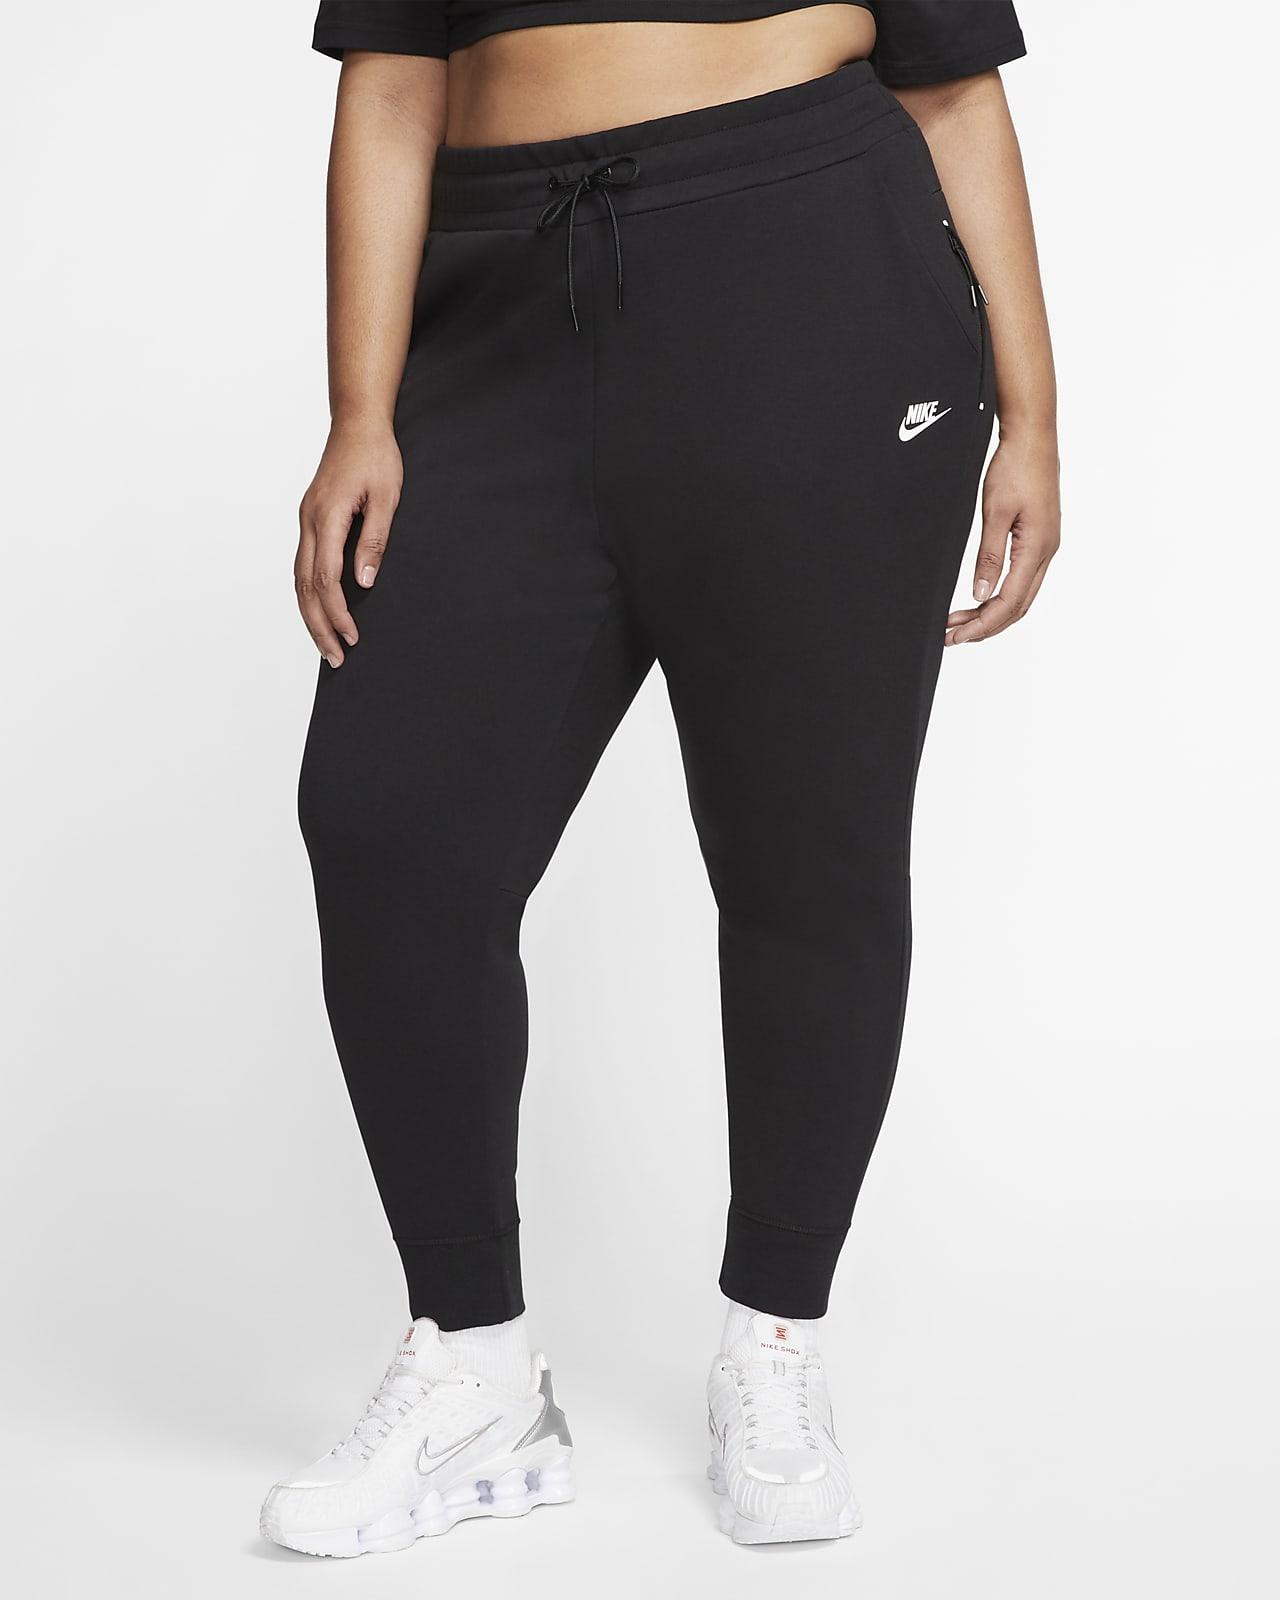 Pantalon Nike Sportswear Tech Fleece pour Femme (grande taille)